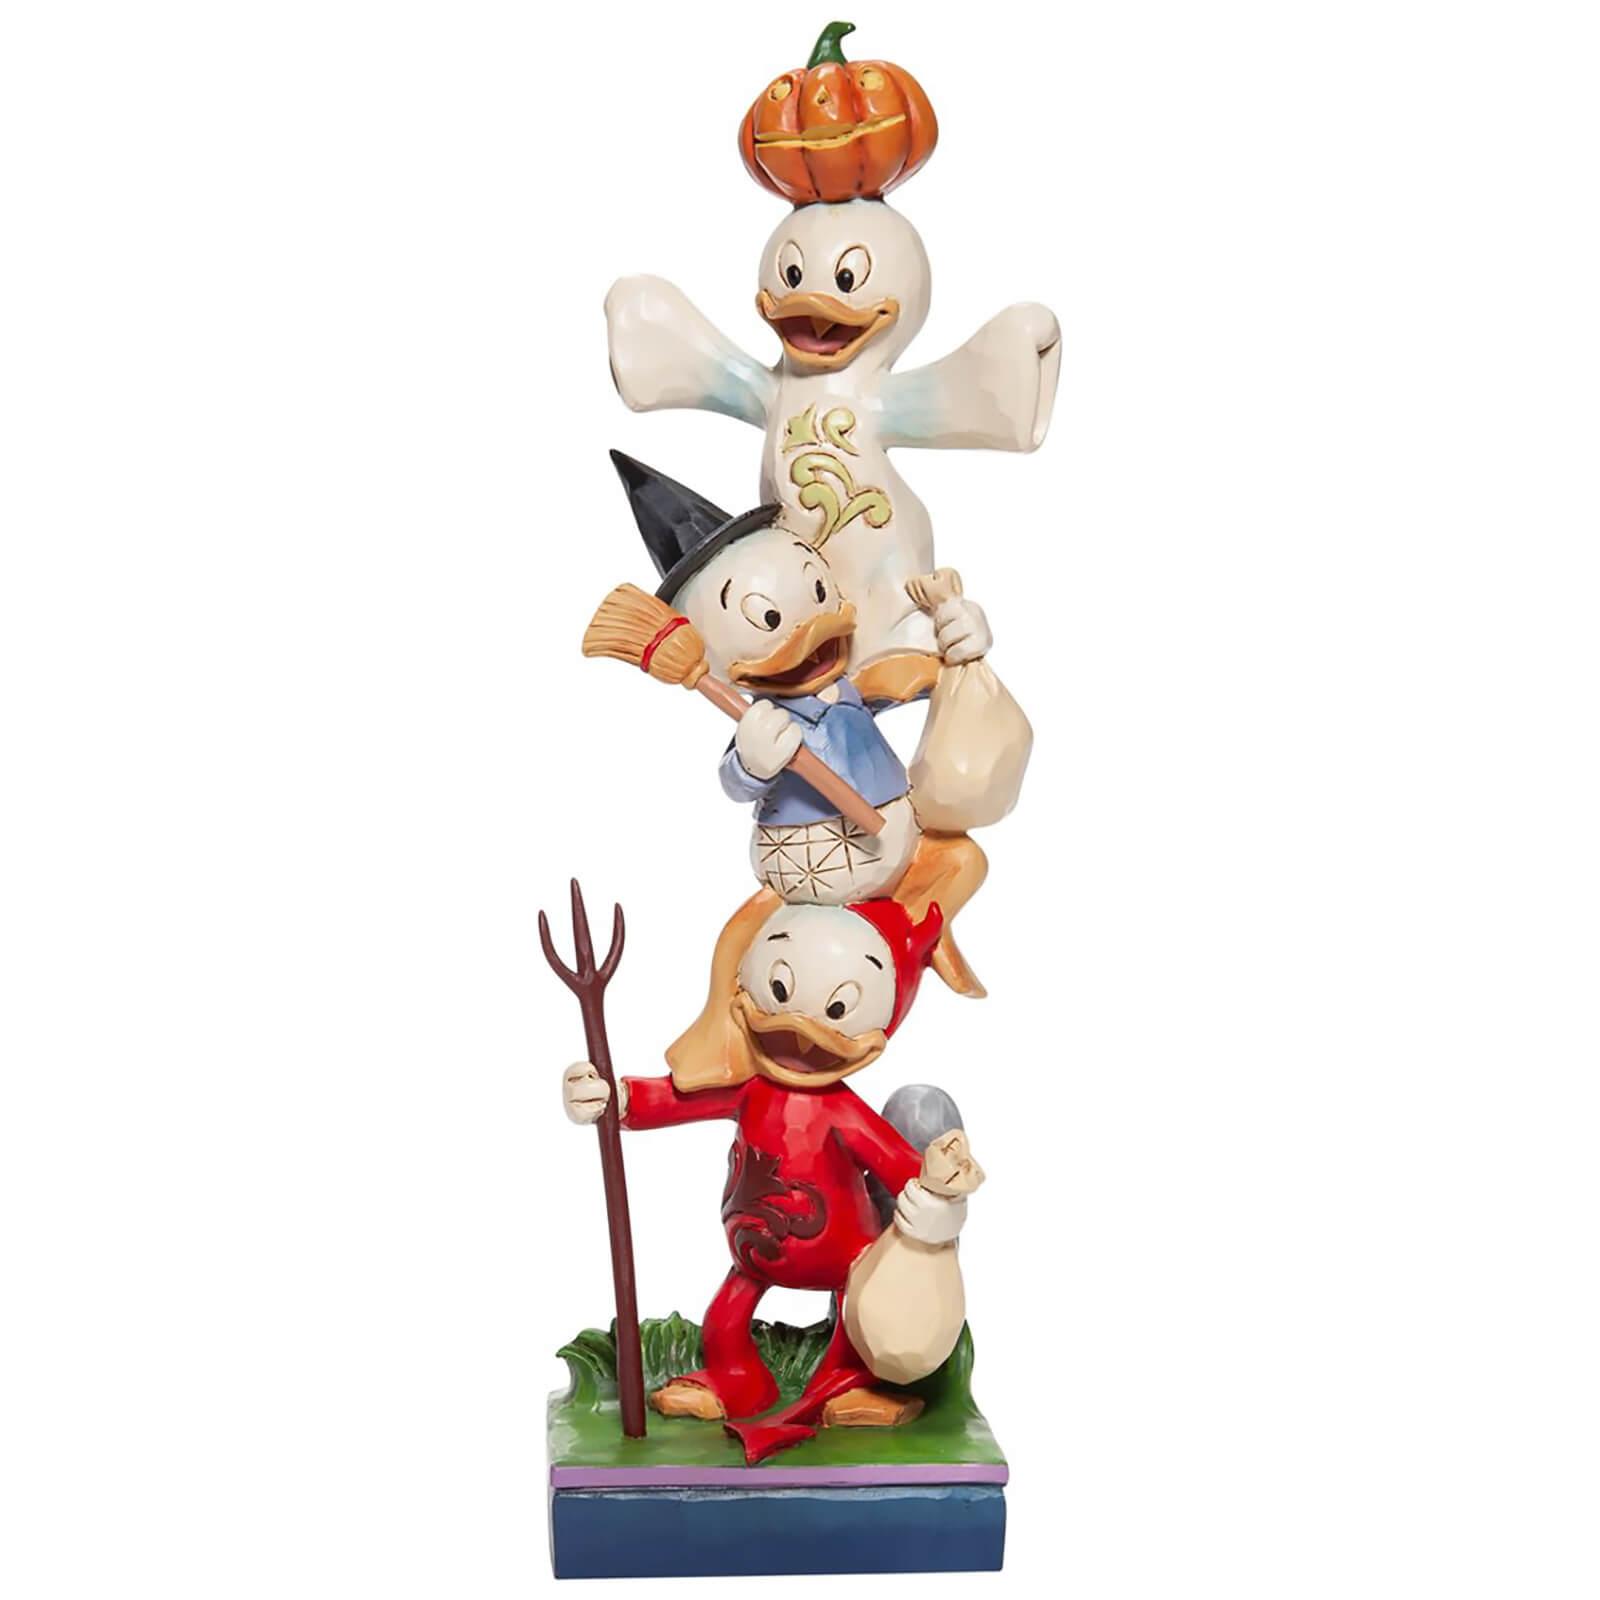 Disney Traditions Huey, Dewey and Louie Figurine 21.5cm